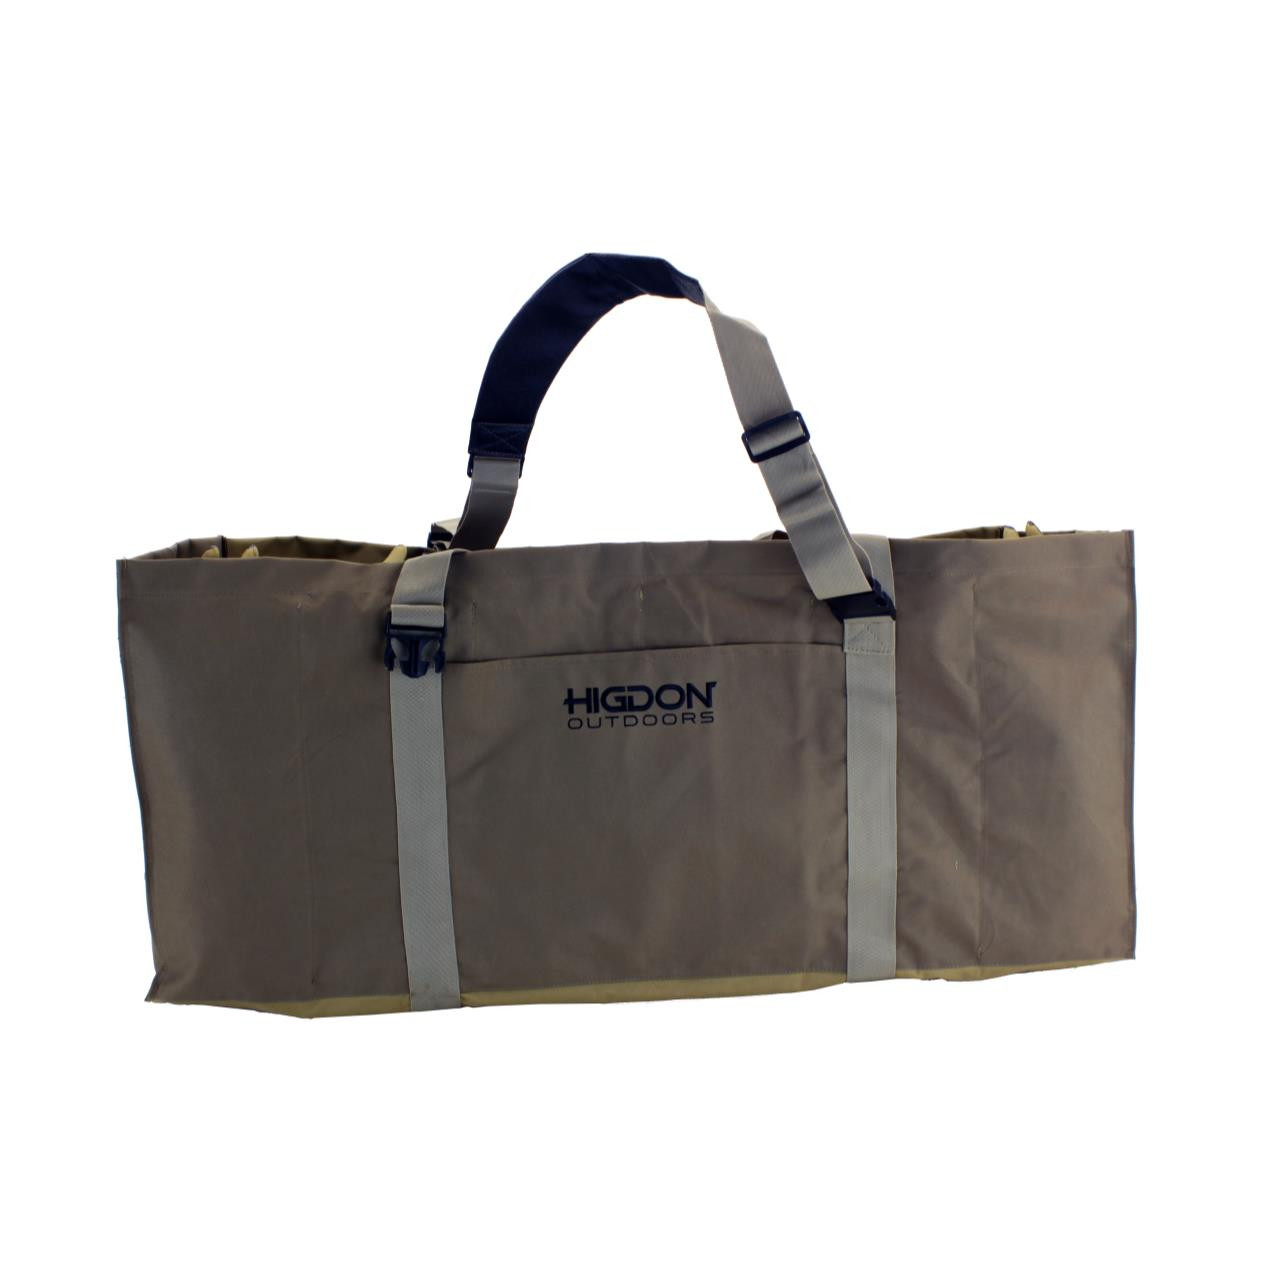 Higdon 12-Slot Duck Decoy Bag - Brown - 710617371201